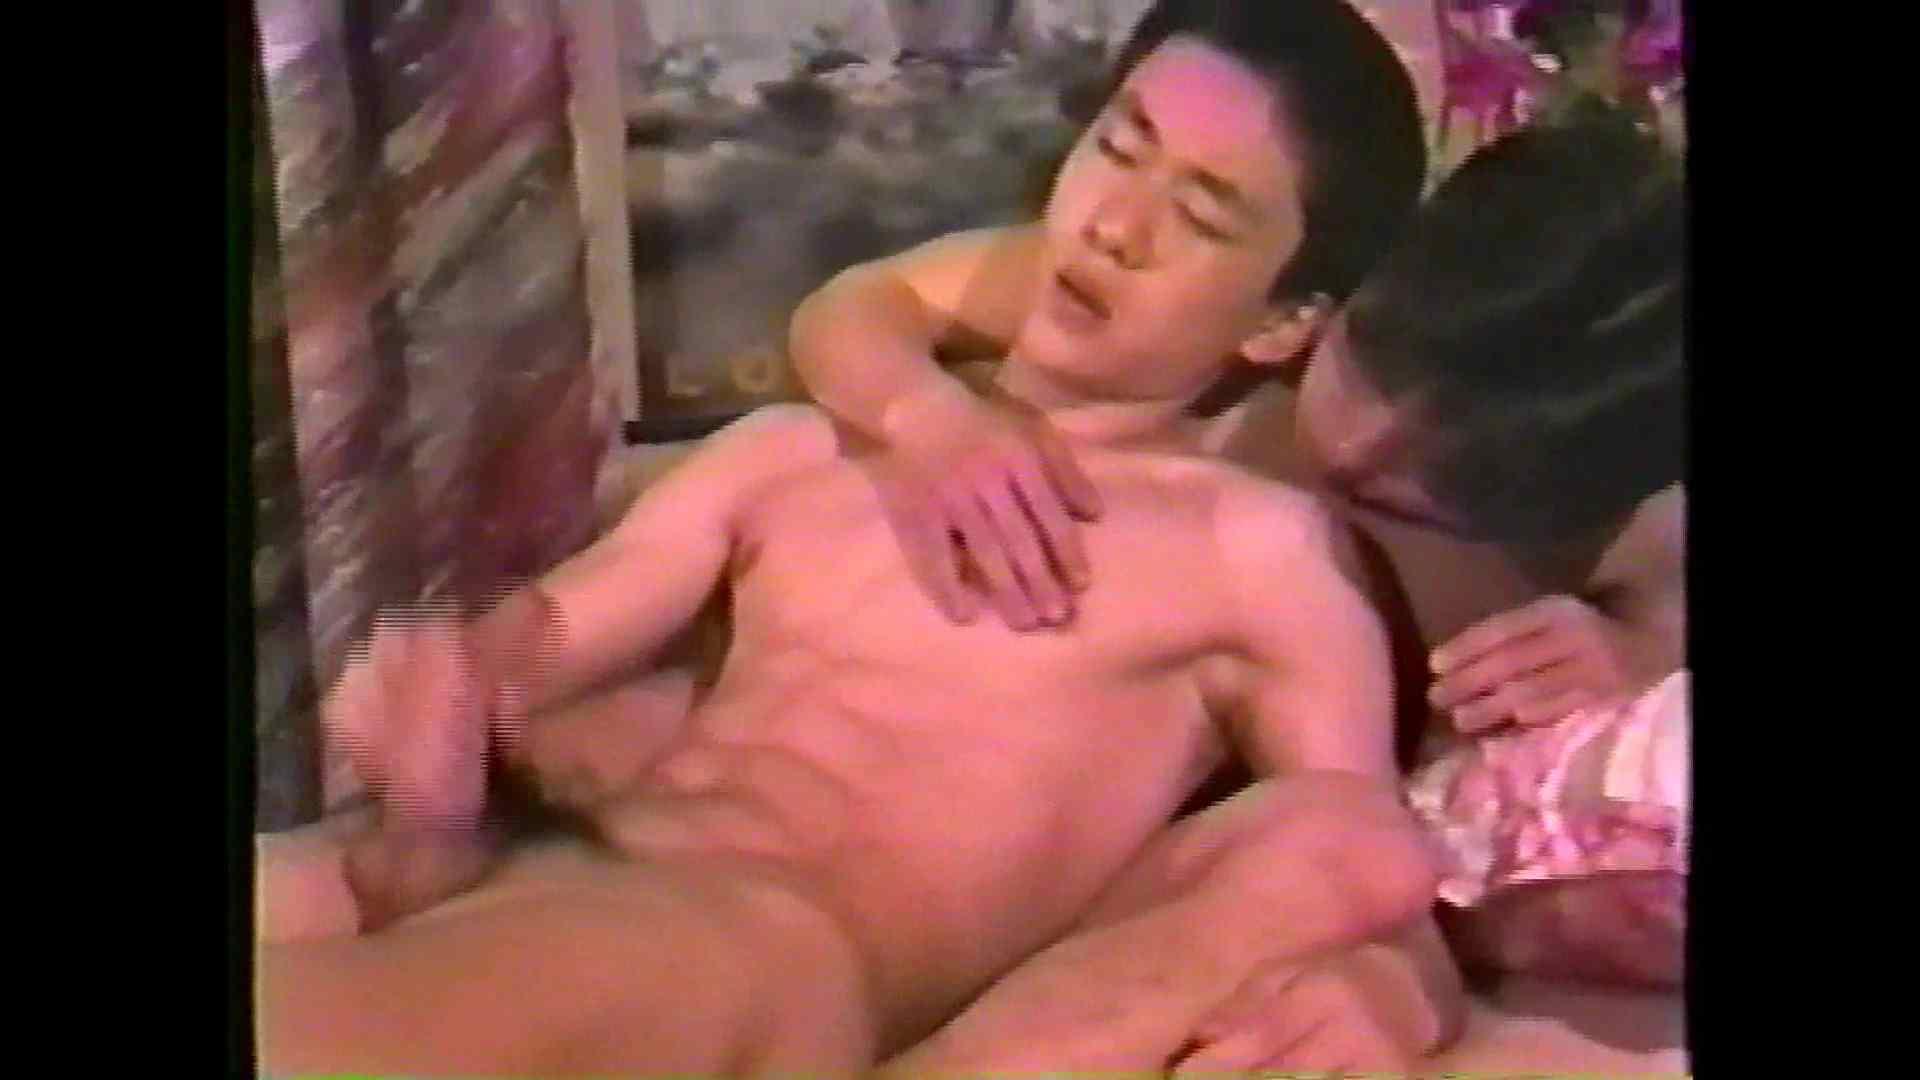 GAYBOY宏のオカズ倉庫Vol.2-2 ゲイのペニス おちんちん画像 81枚 66